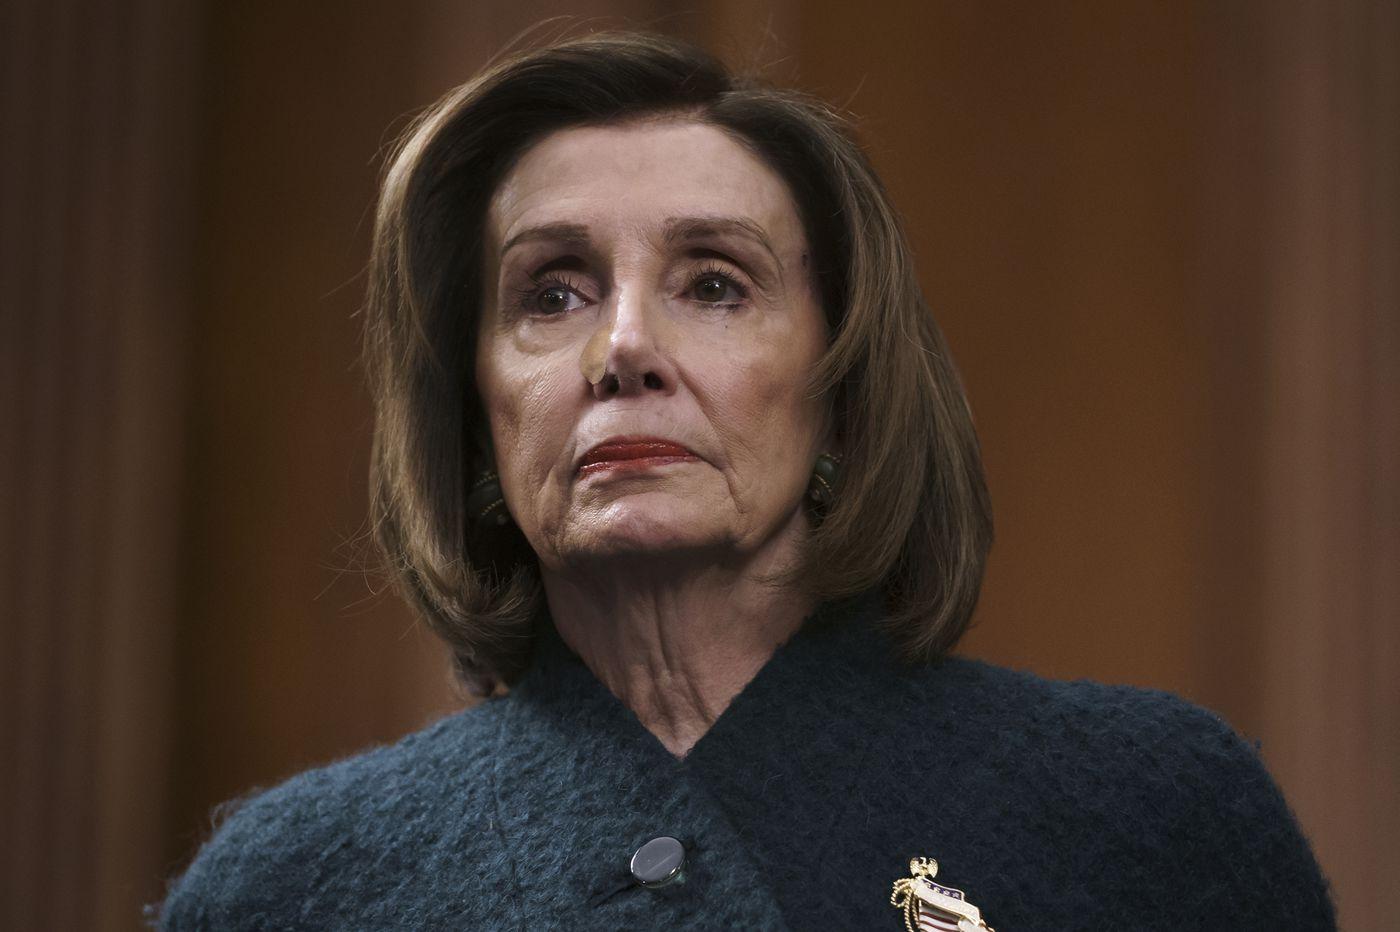 Nancy Pelosi says Catholics don't hate — but I do | Christine Flowers